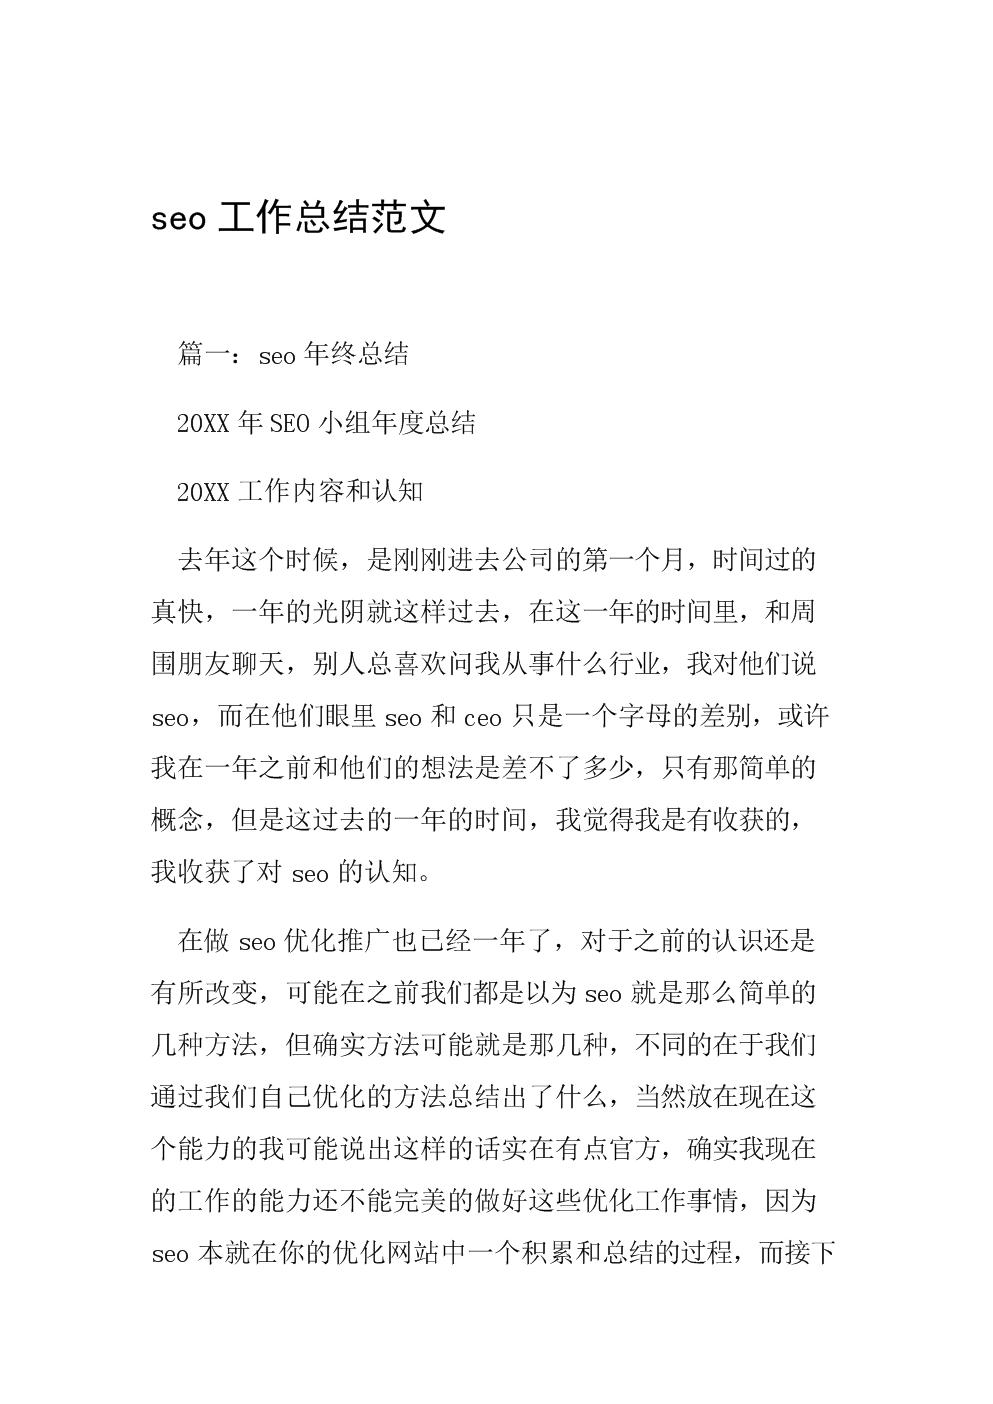 seo工作总结范文.doc